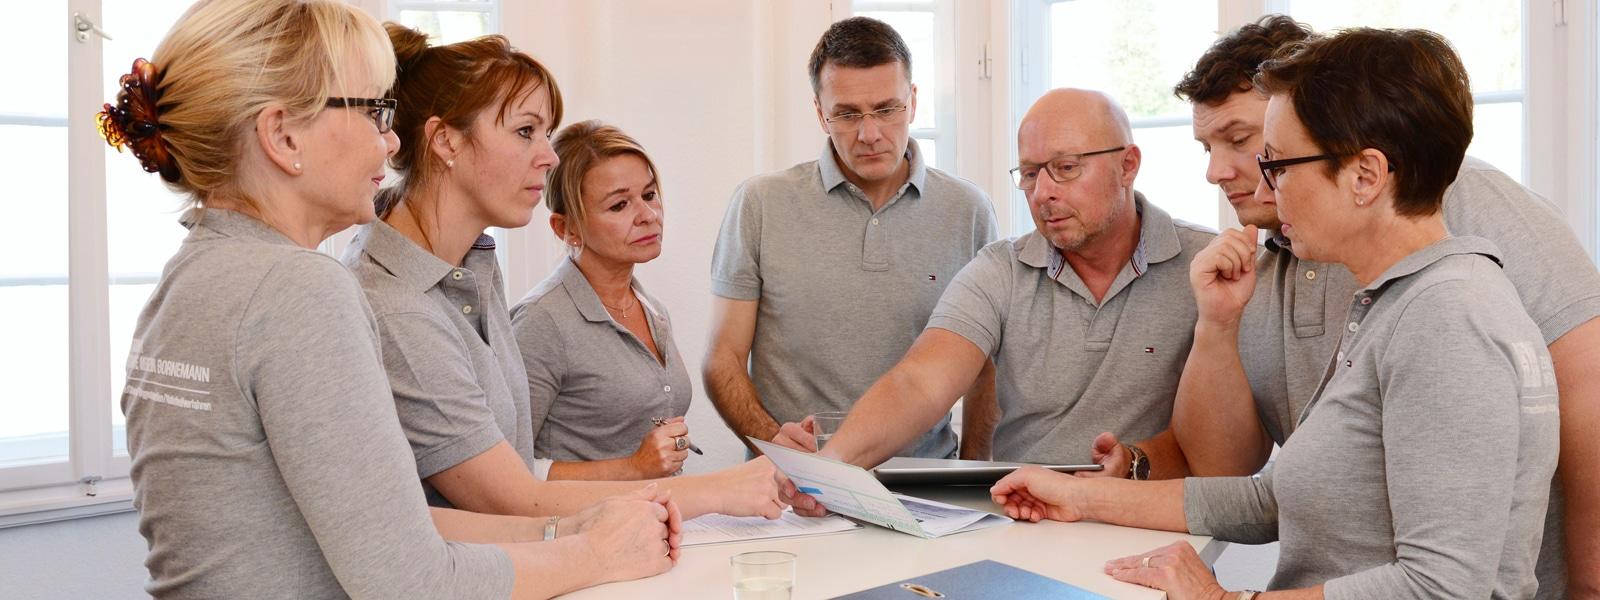 Team, Zentrum für integrative Medizin Bornemann, Lübeck